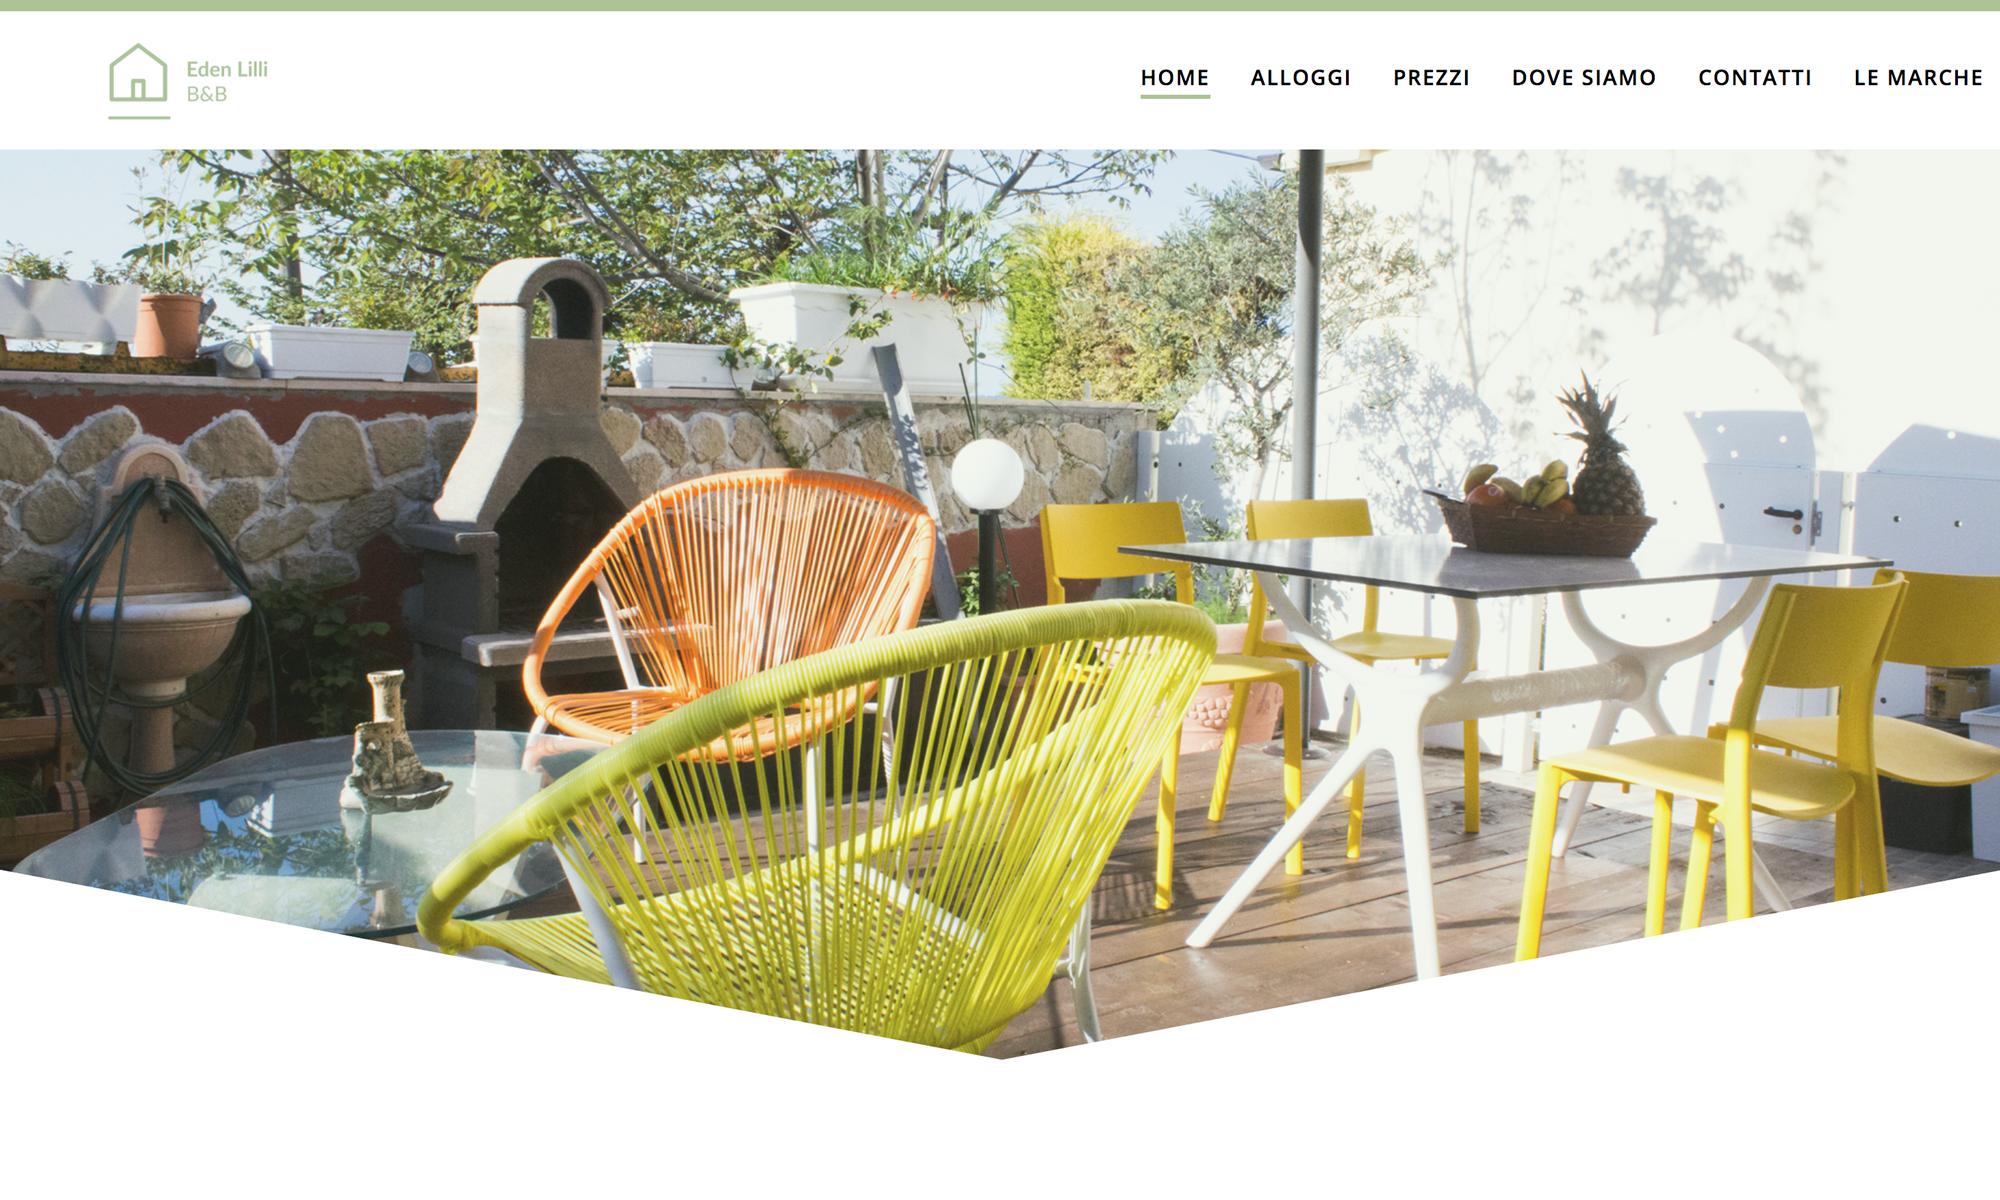 Web site design Eden Lilli B&B